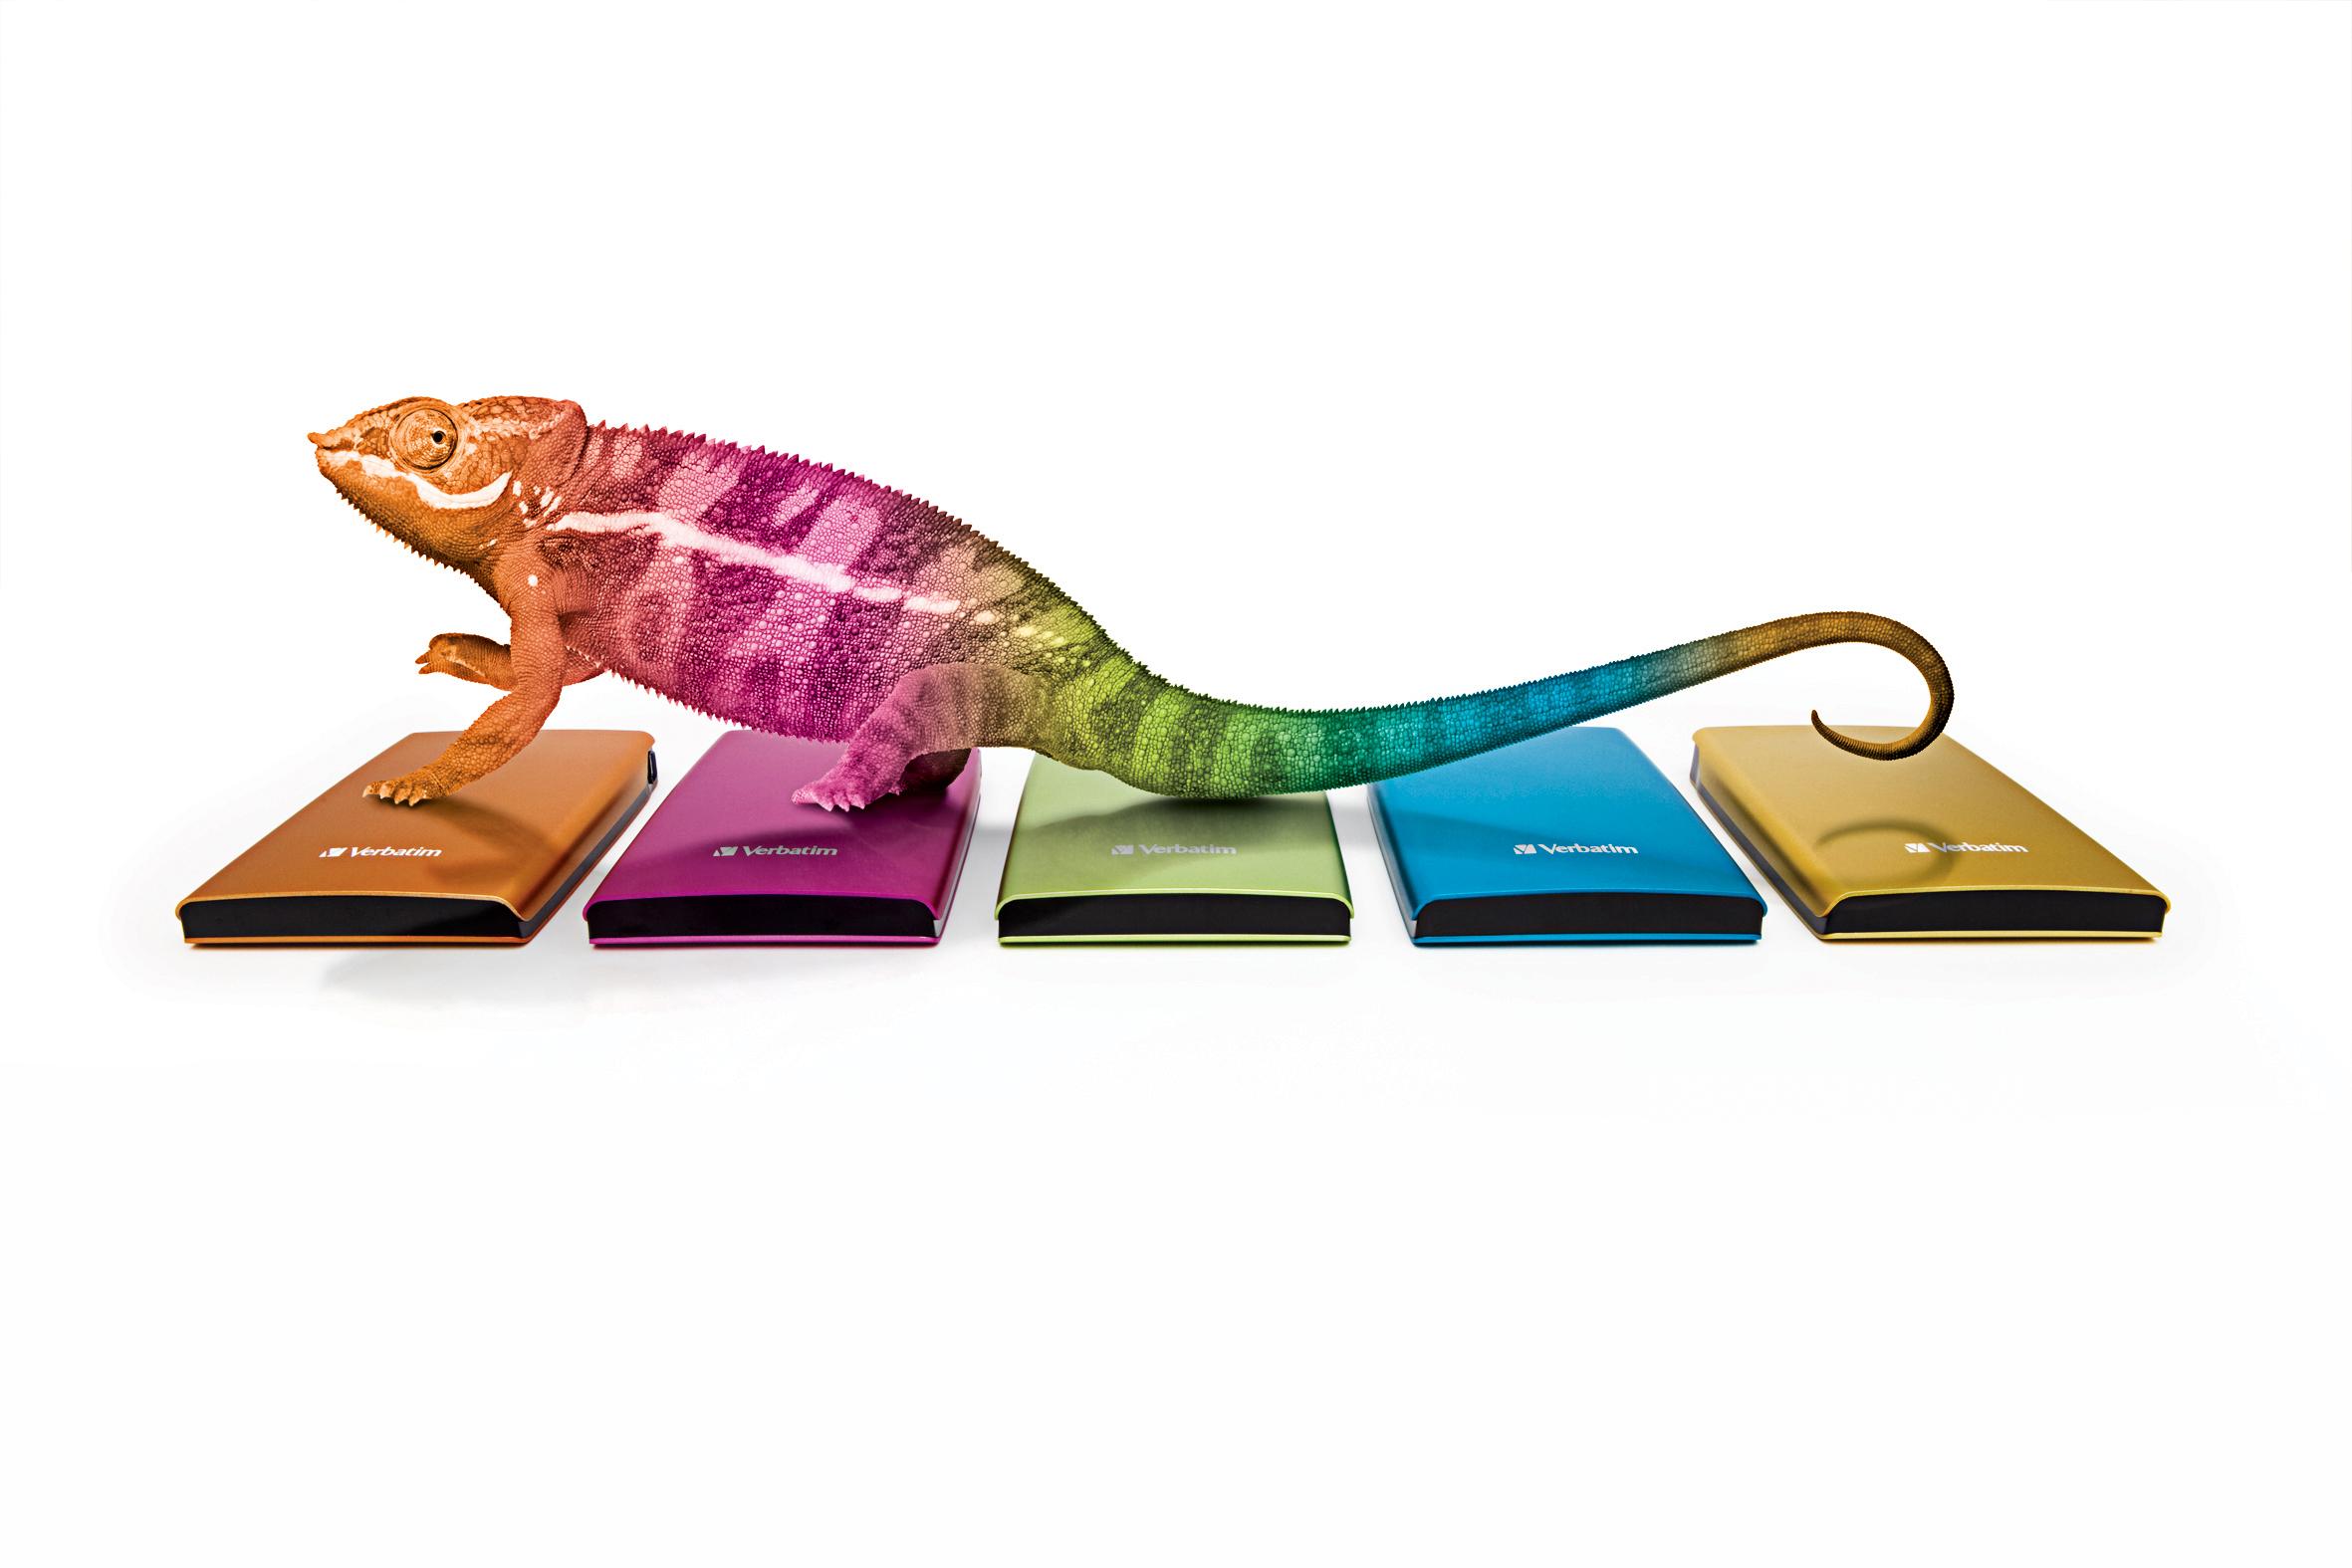 ChameleonBillboard_Graphic_LowRes222.jpg